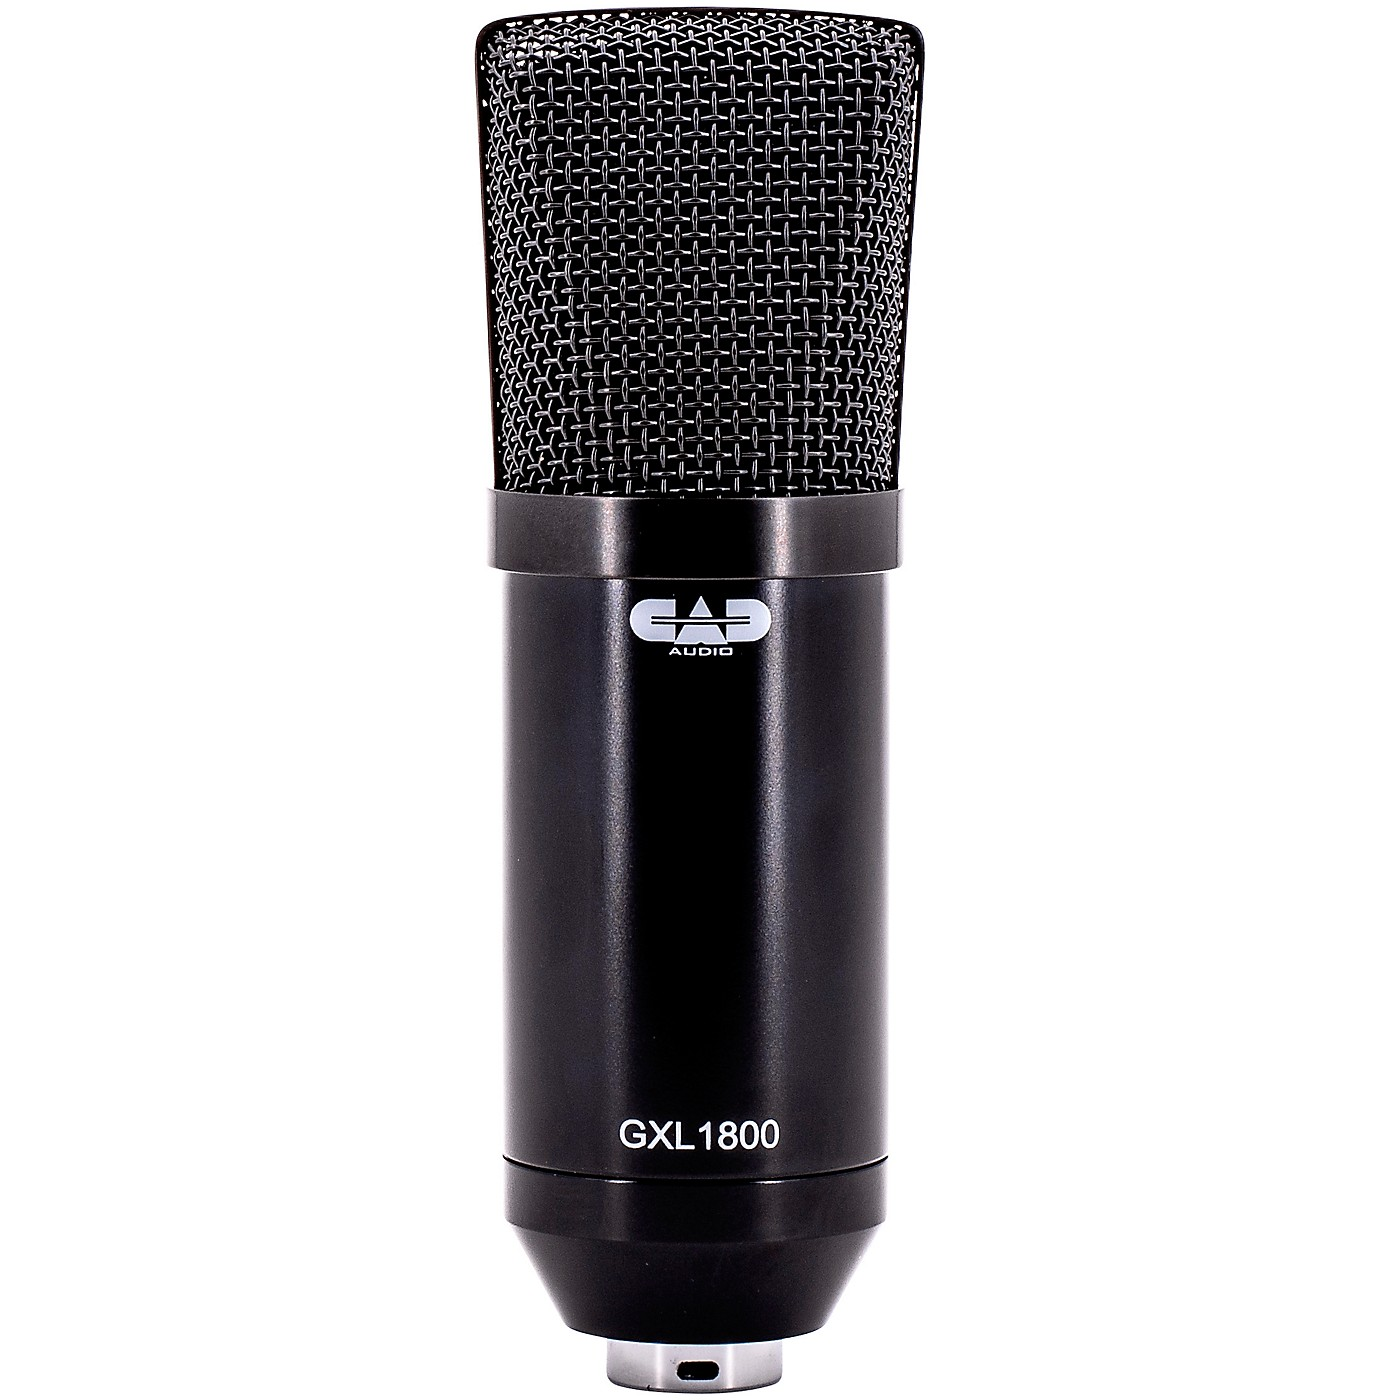 CAD GXL1800 Large Format Side Address Studio Microphone thumbnail